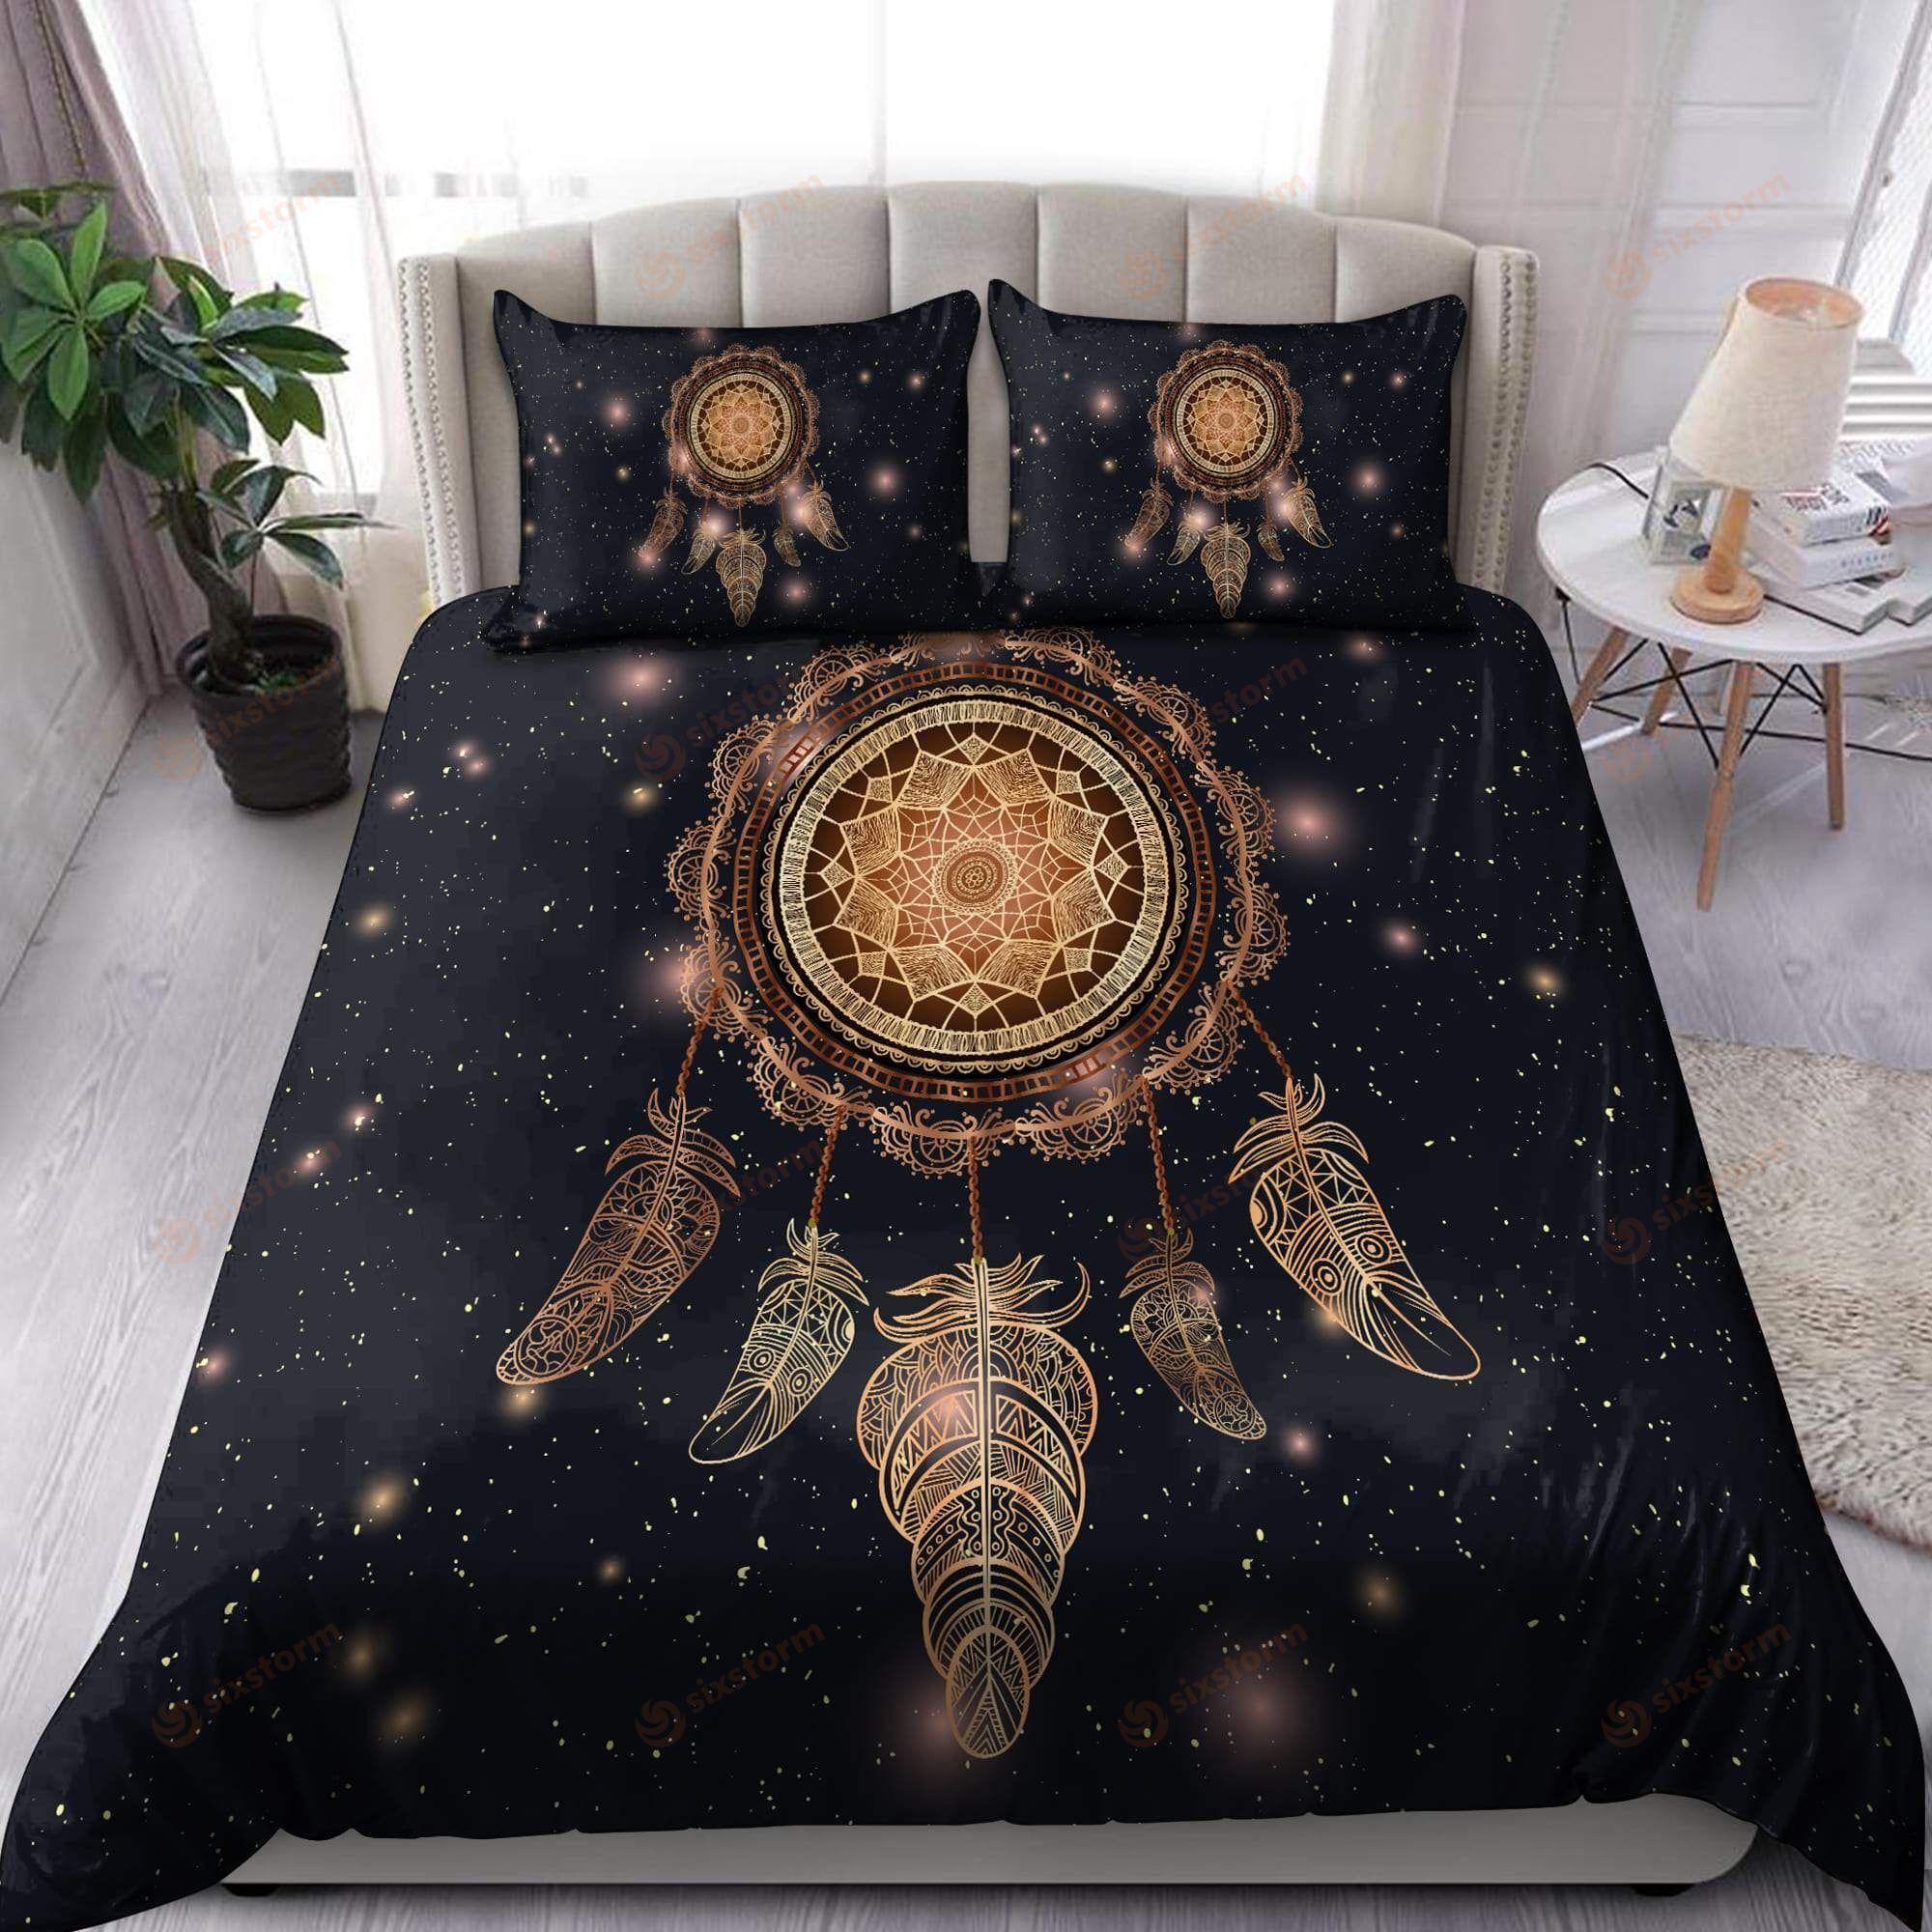 Native American Dreamcatcher Night Bedding Sets